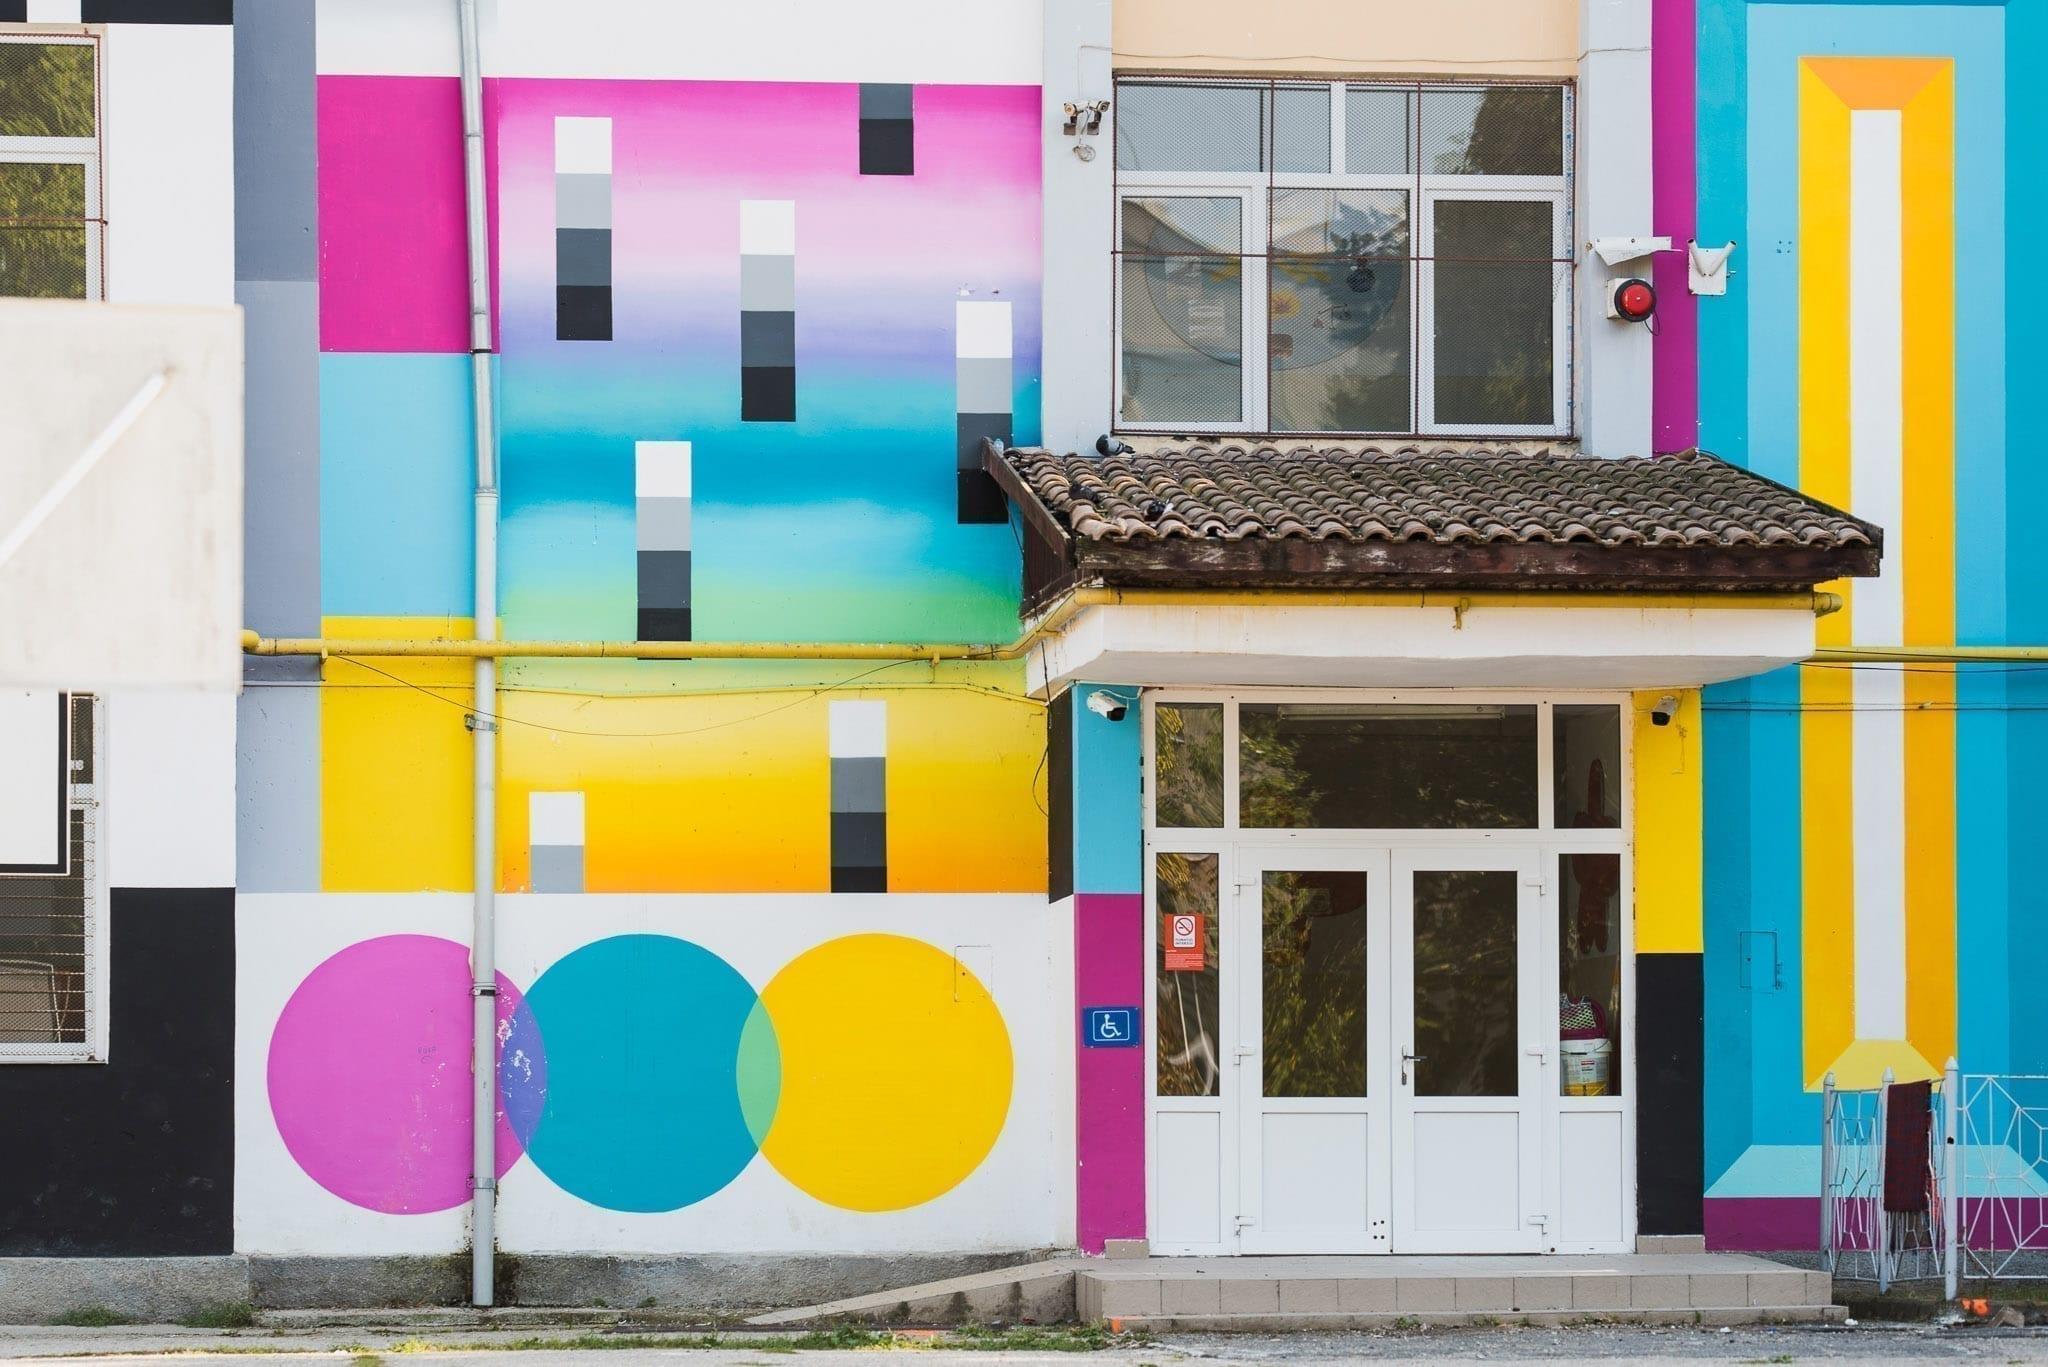 LOST Optics (Sweet Damage Crew) Școala Gimnazială Octavian Goga Cluj Un-hidden Street Art in Romania book photo © Anita Jimbor, Un-hidden Romania